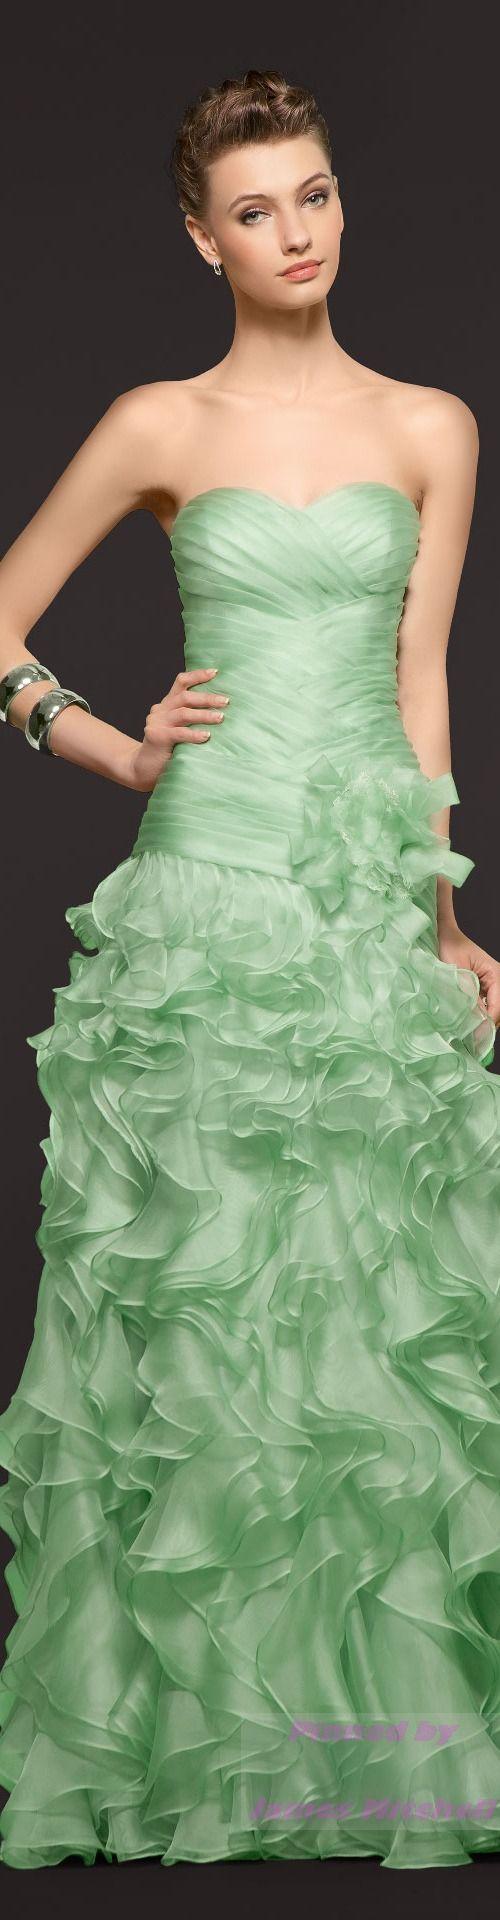 Farb-und Stilberatung mit www.farben-reich.com - Aire Barcelona Coctail Dress Collection